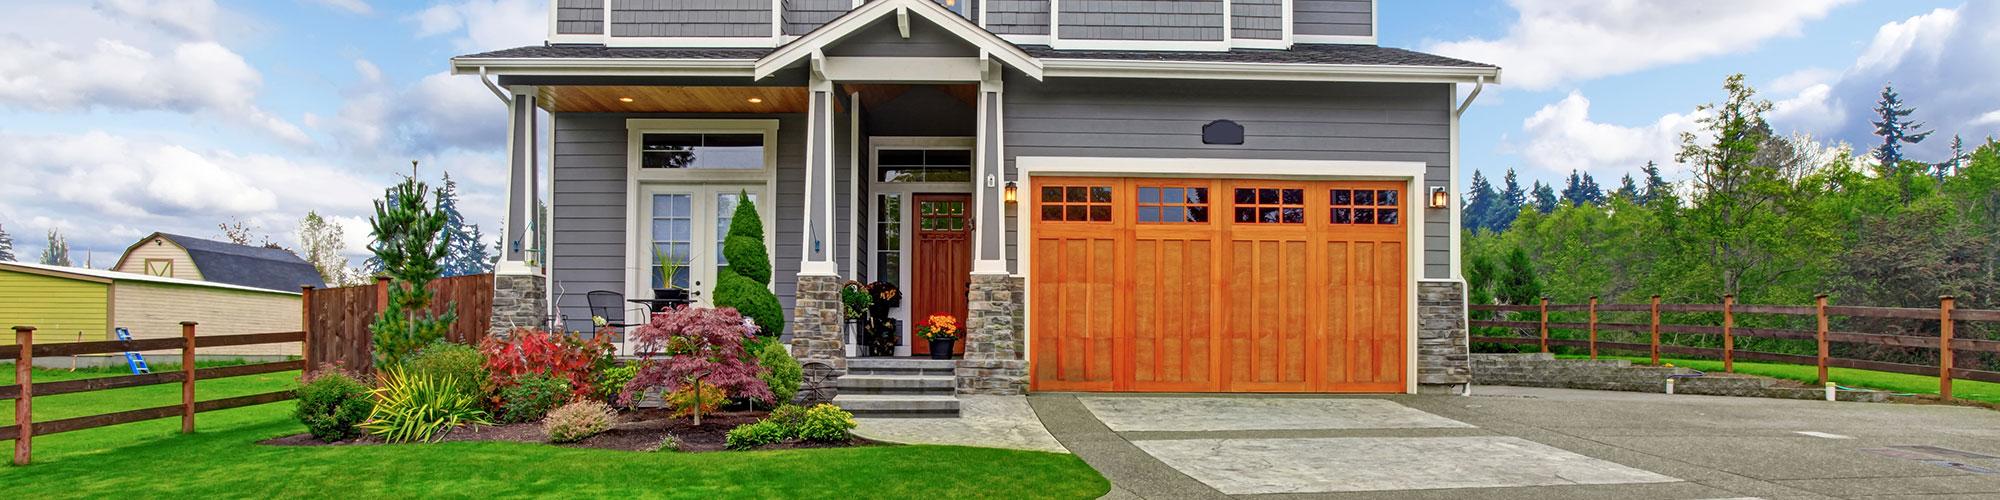 garage-door-repair-los-angeles-1 Garage Door Repair Santa Clarita